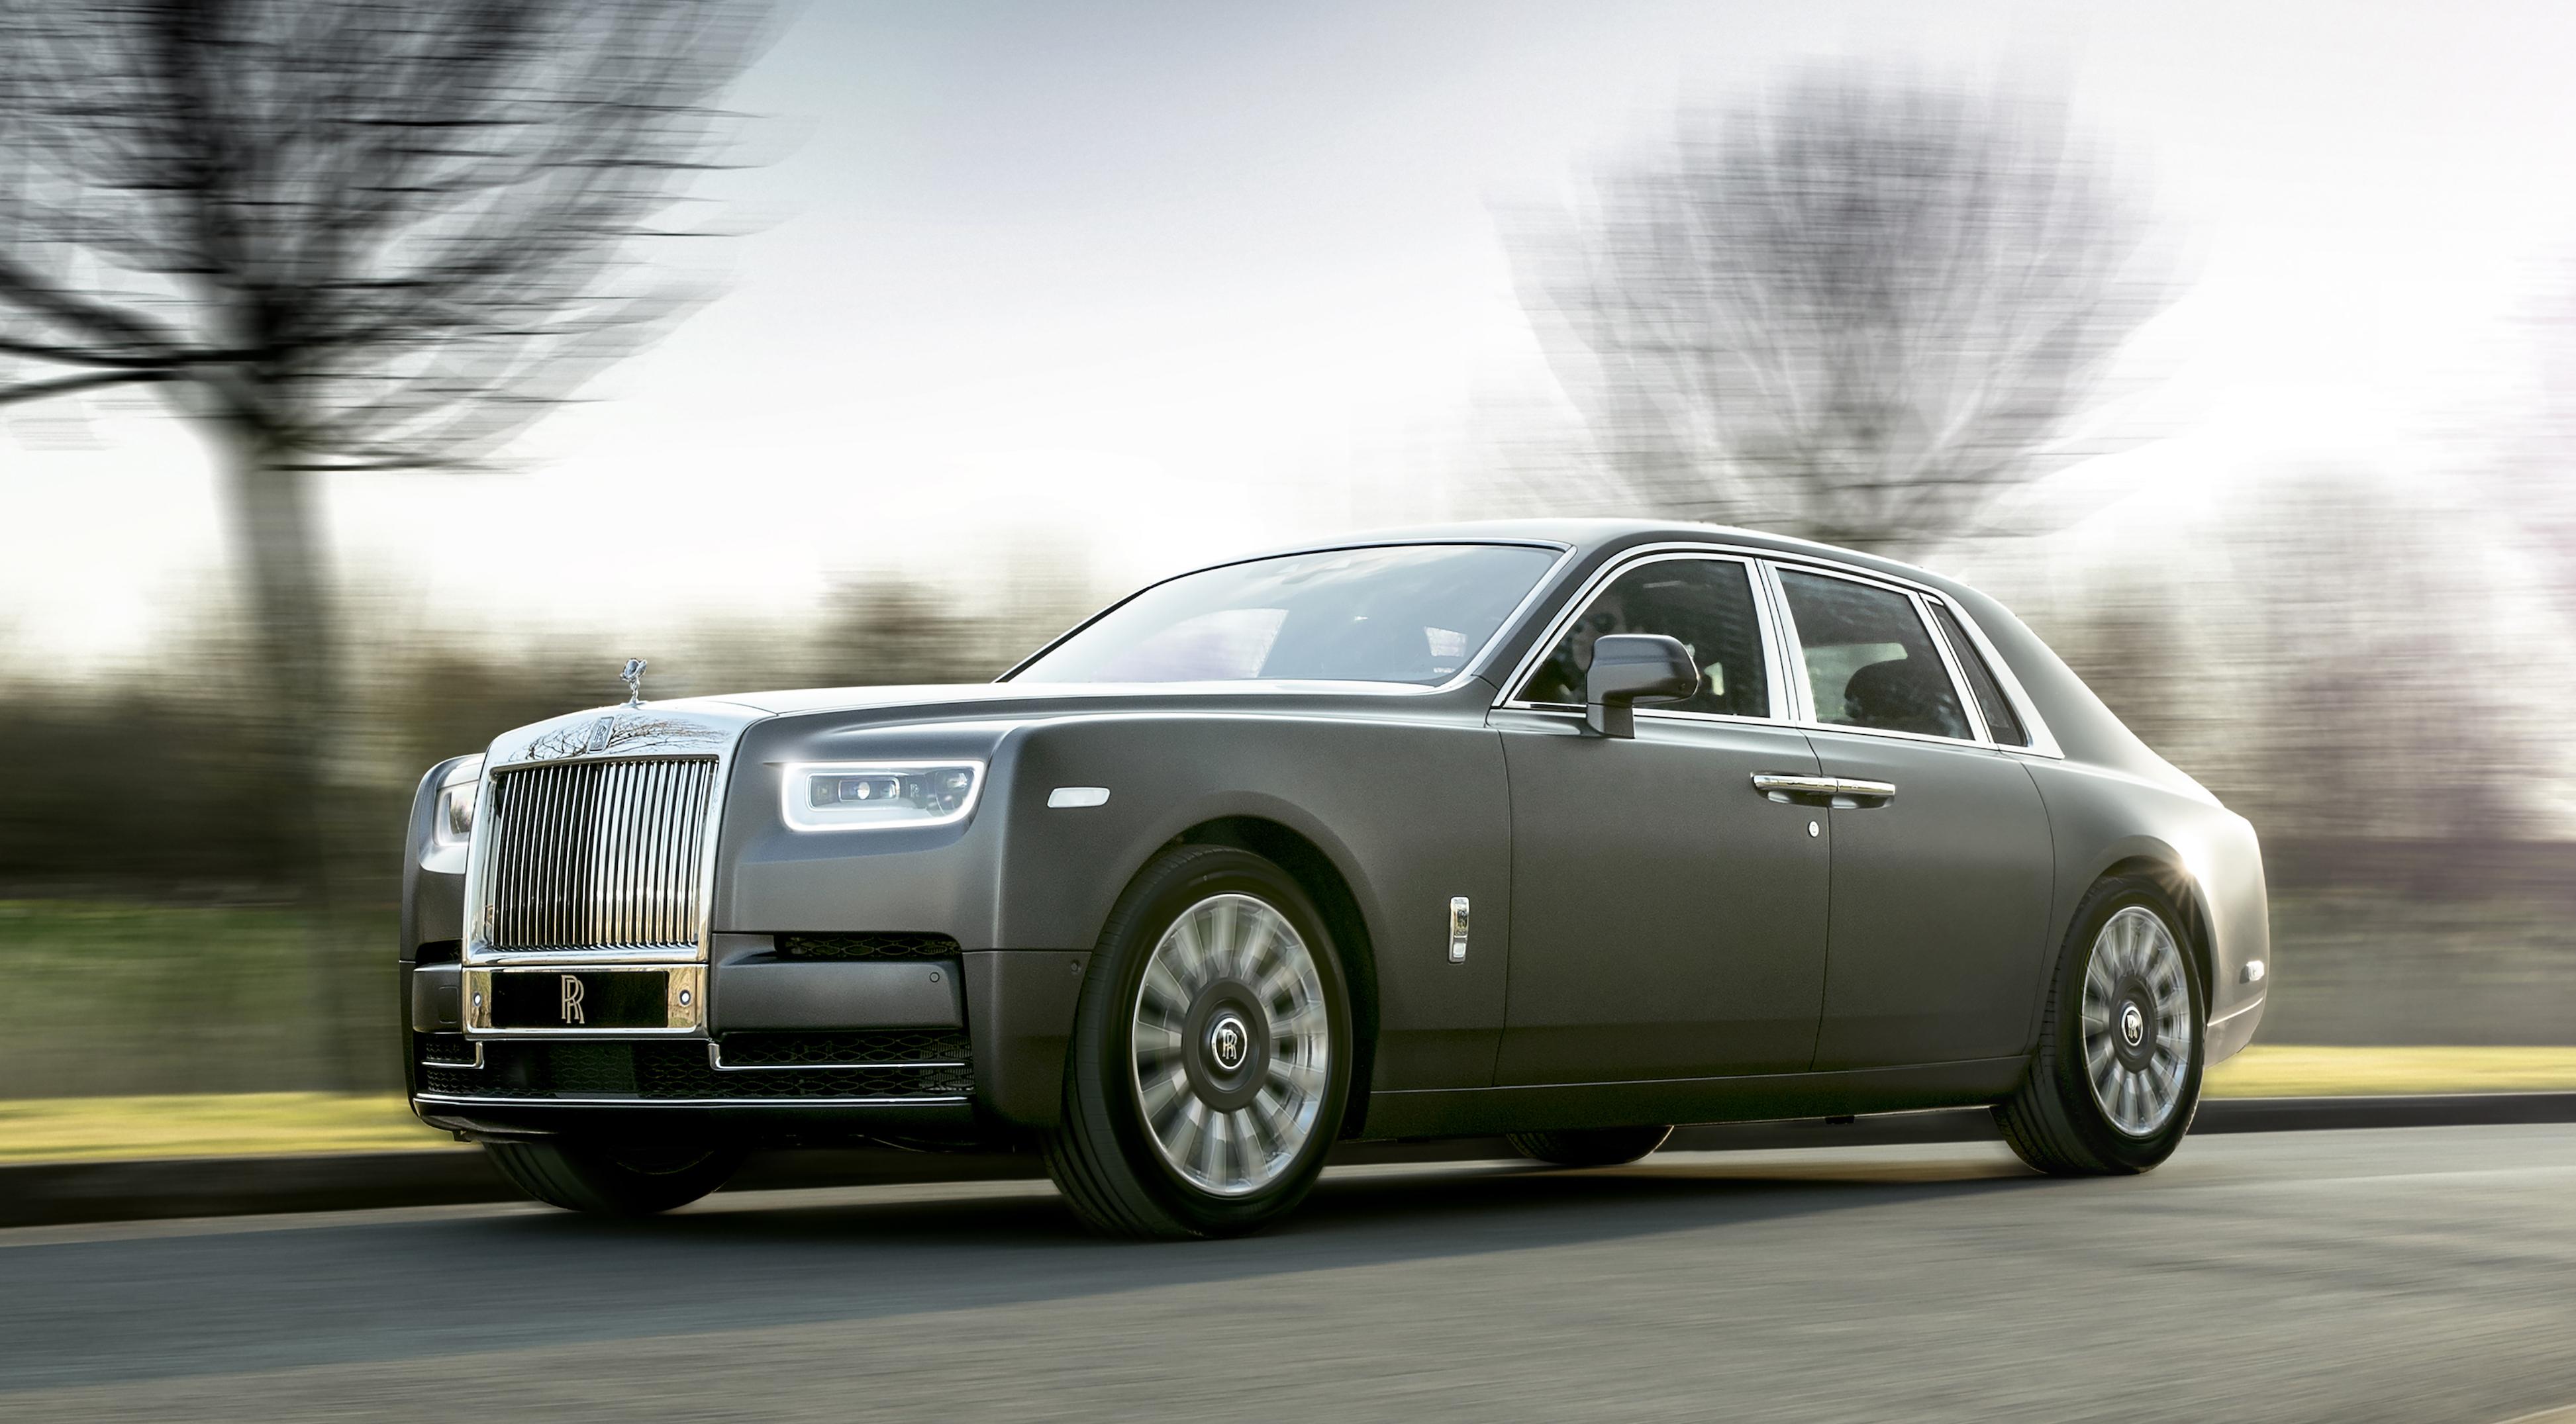 A dark gray 2018 Rolls-Royce Phantom, a large and opulent super-luxury sedan